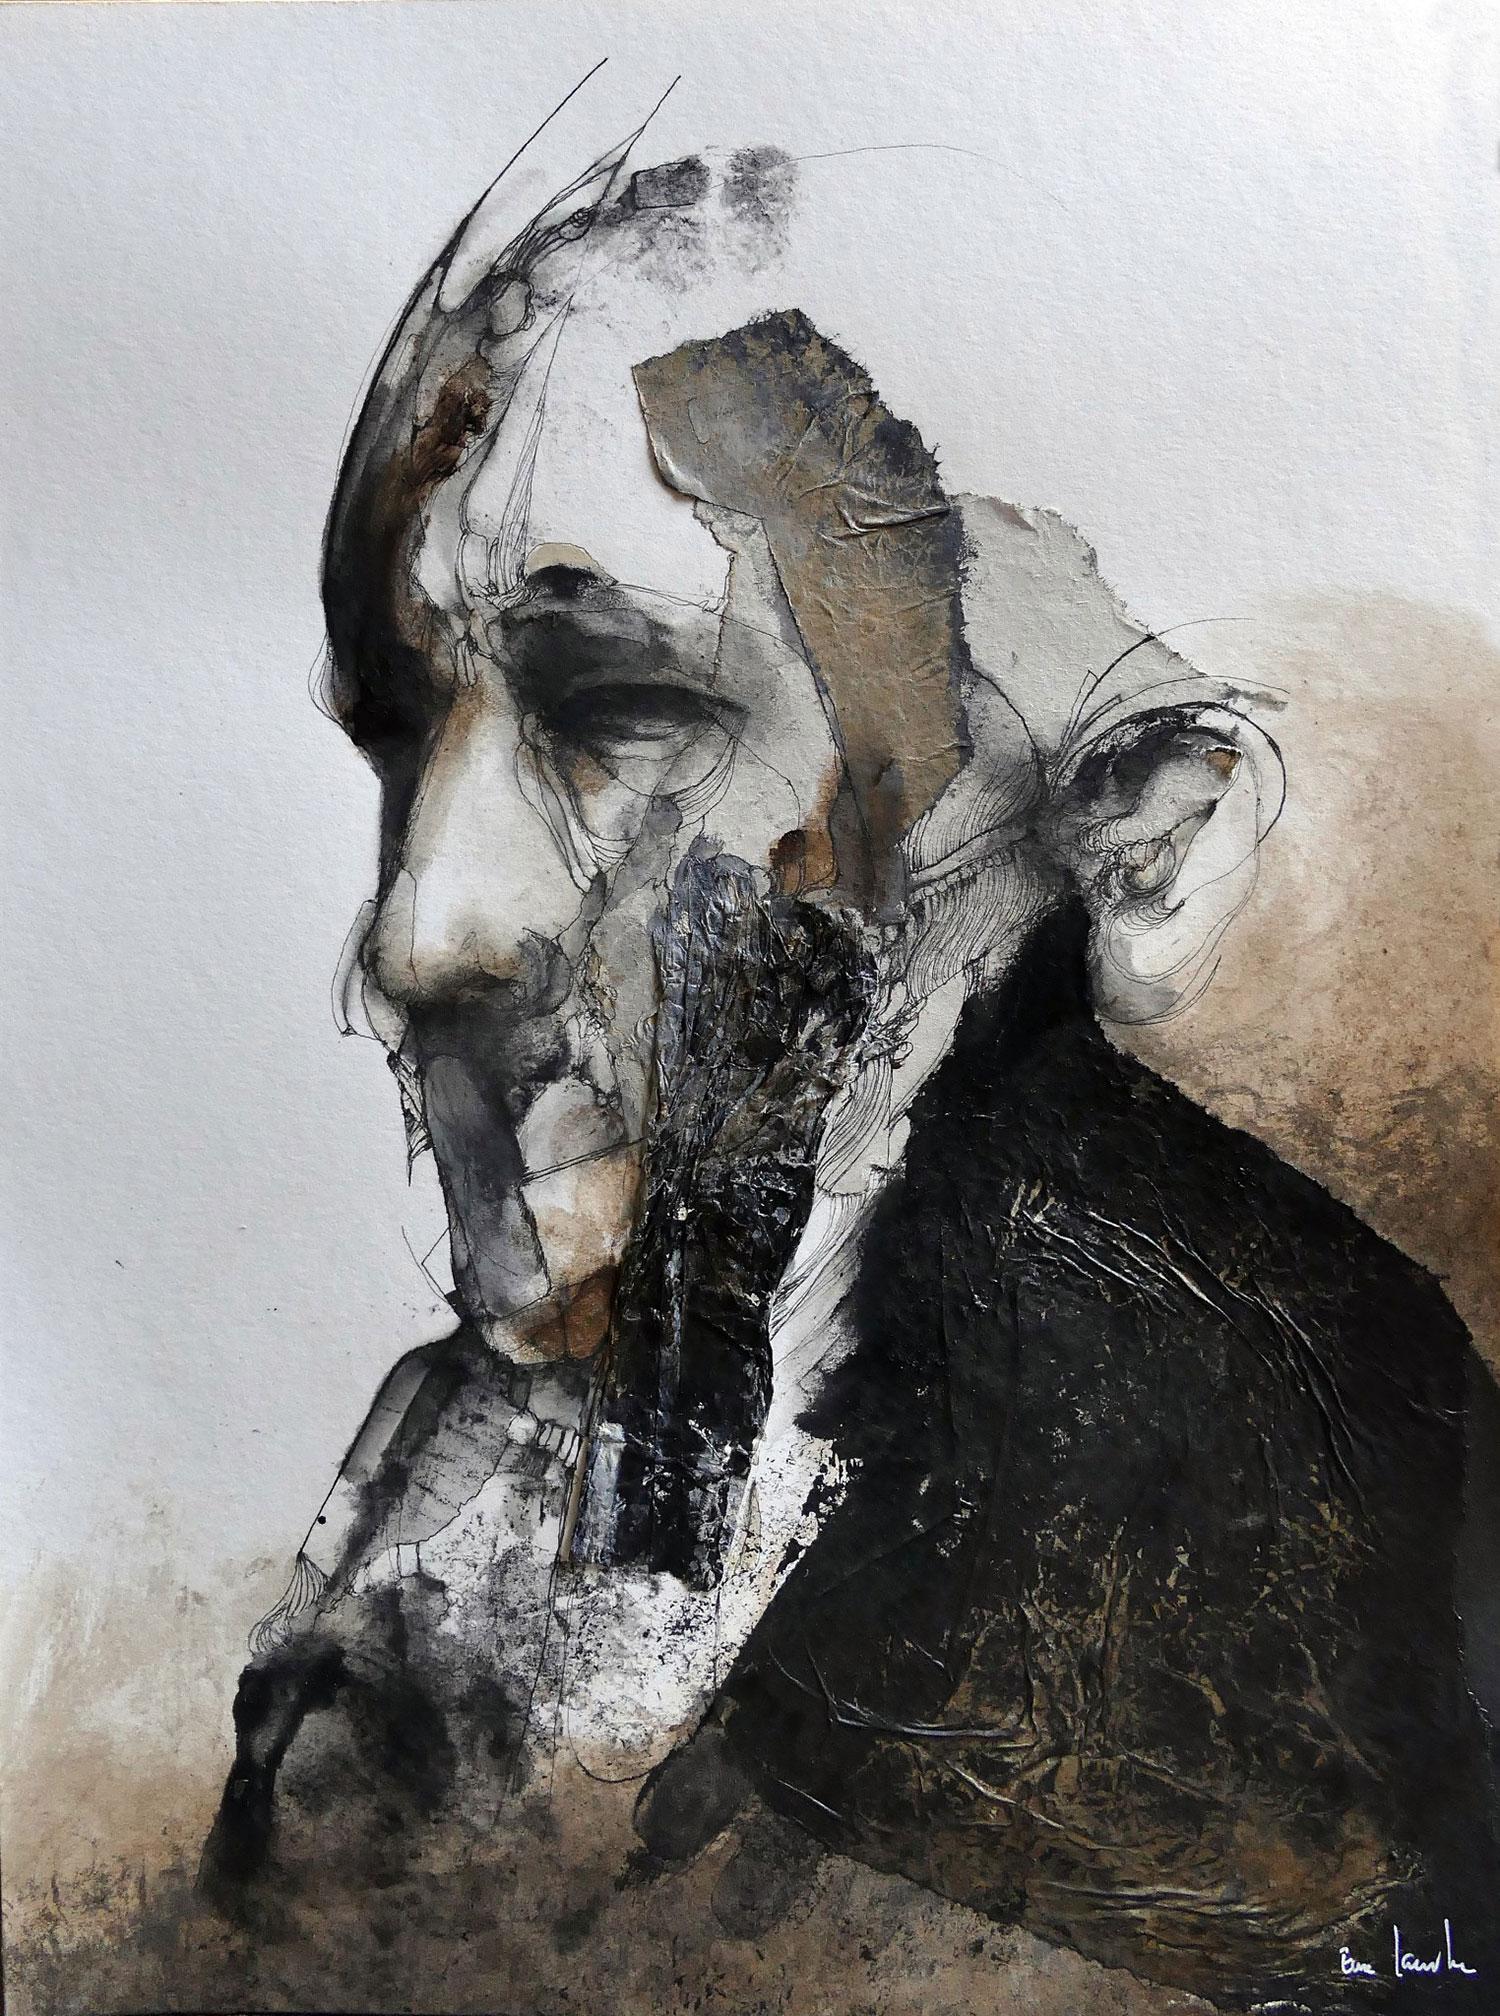 Eric Lacombe - old man